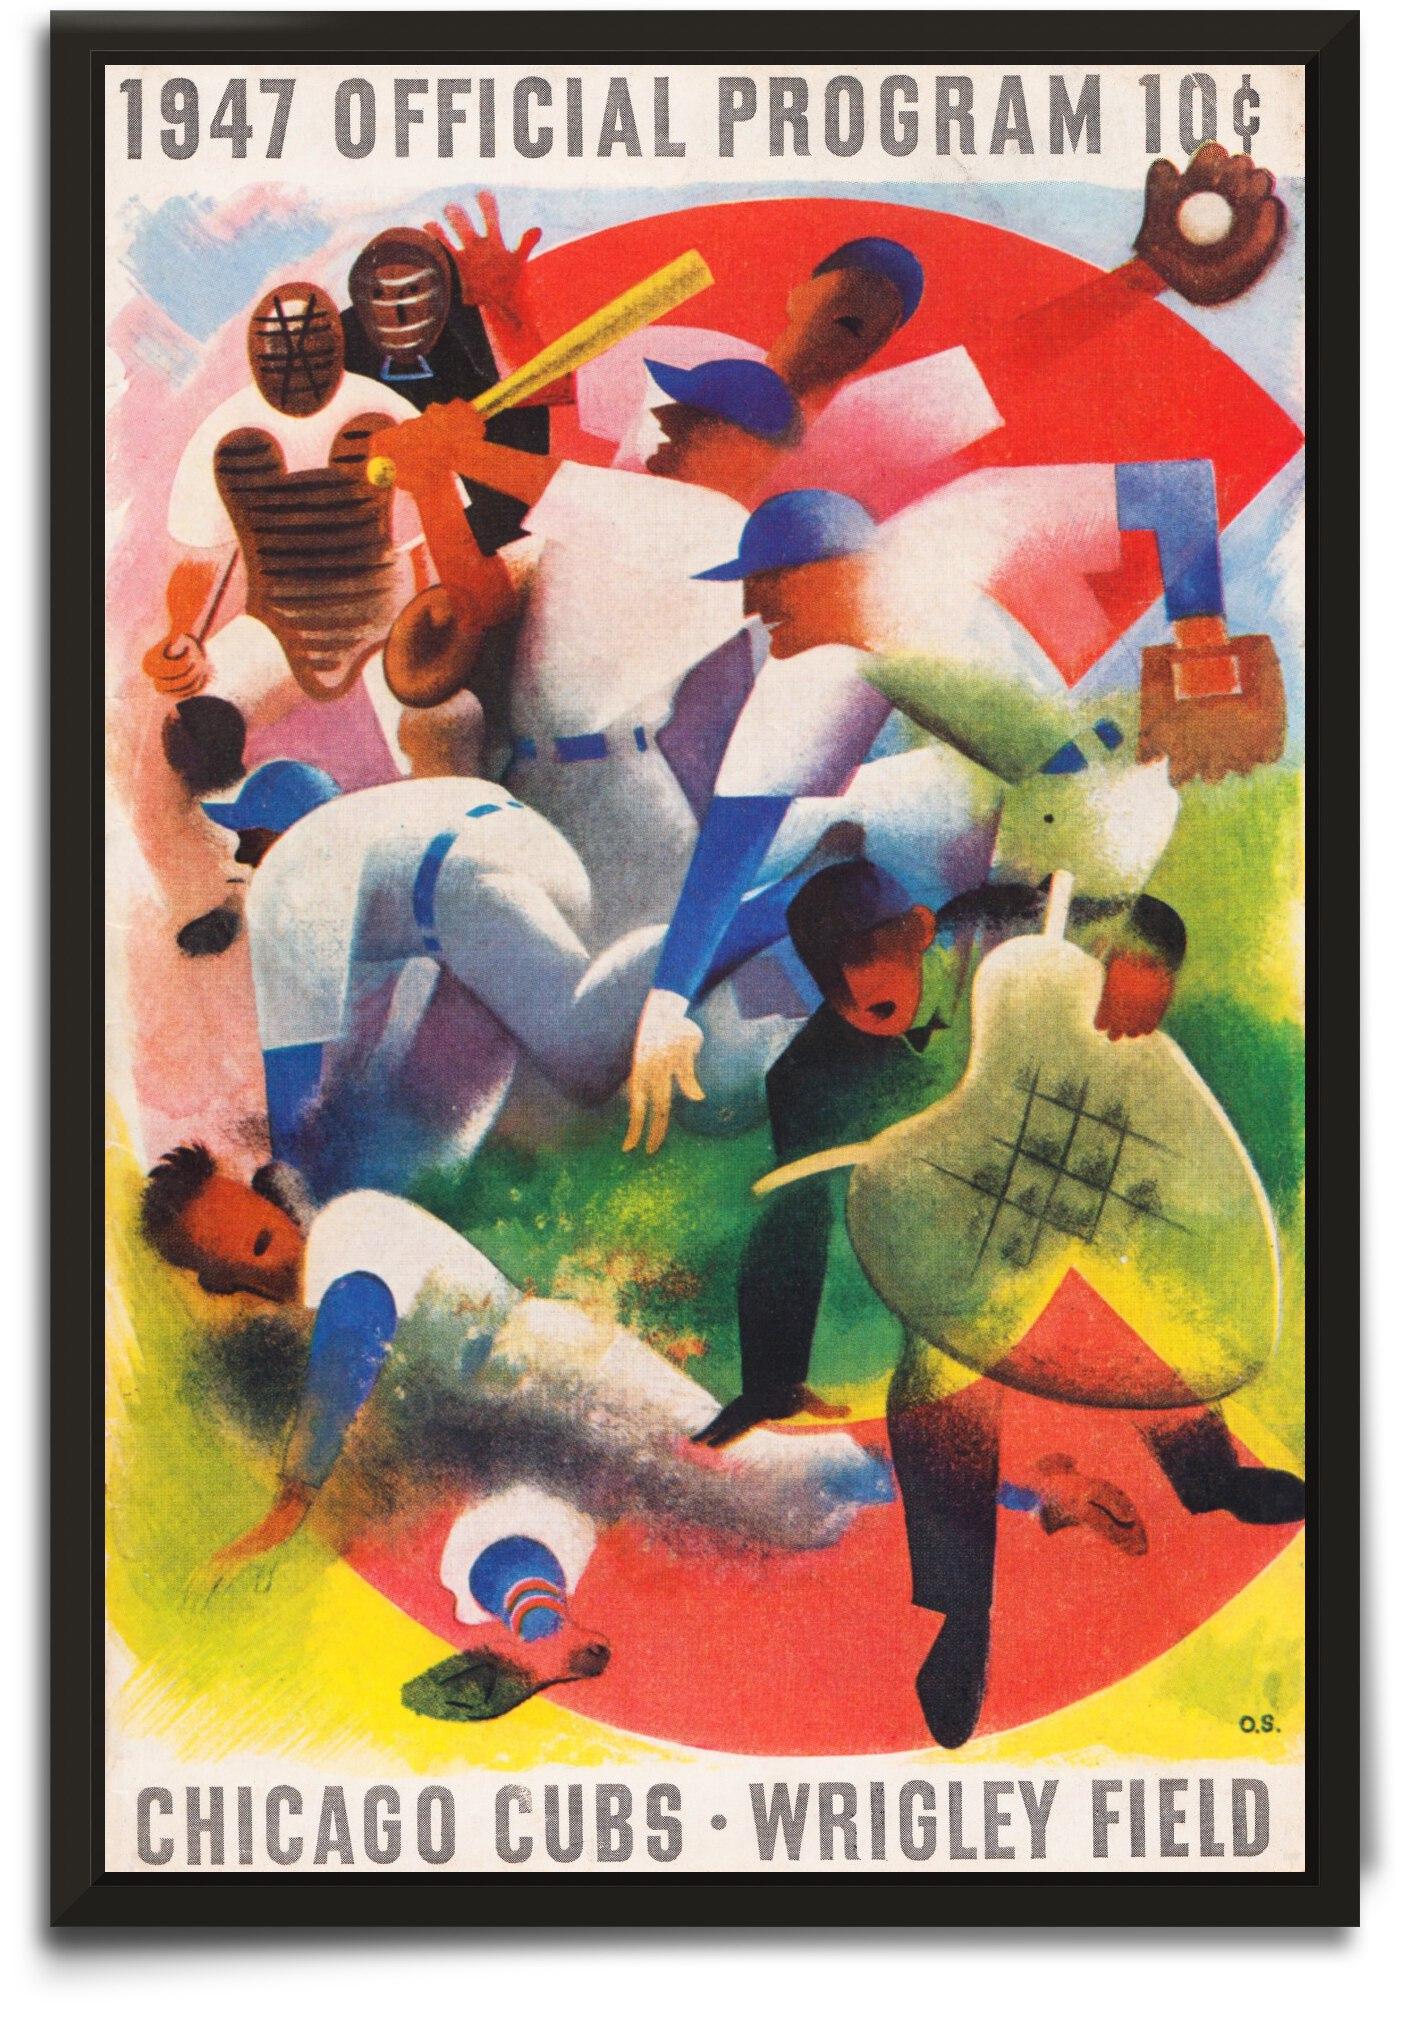 1947 Chicago Cubs Program Otis Shepard Art by Row One Brand